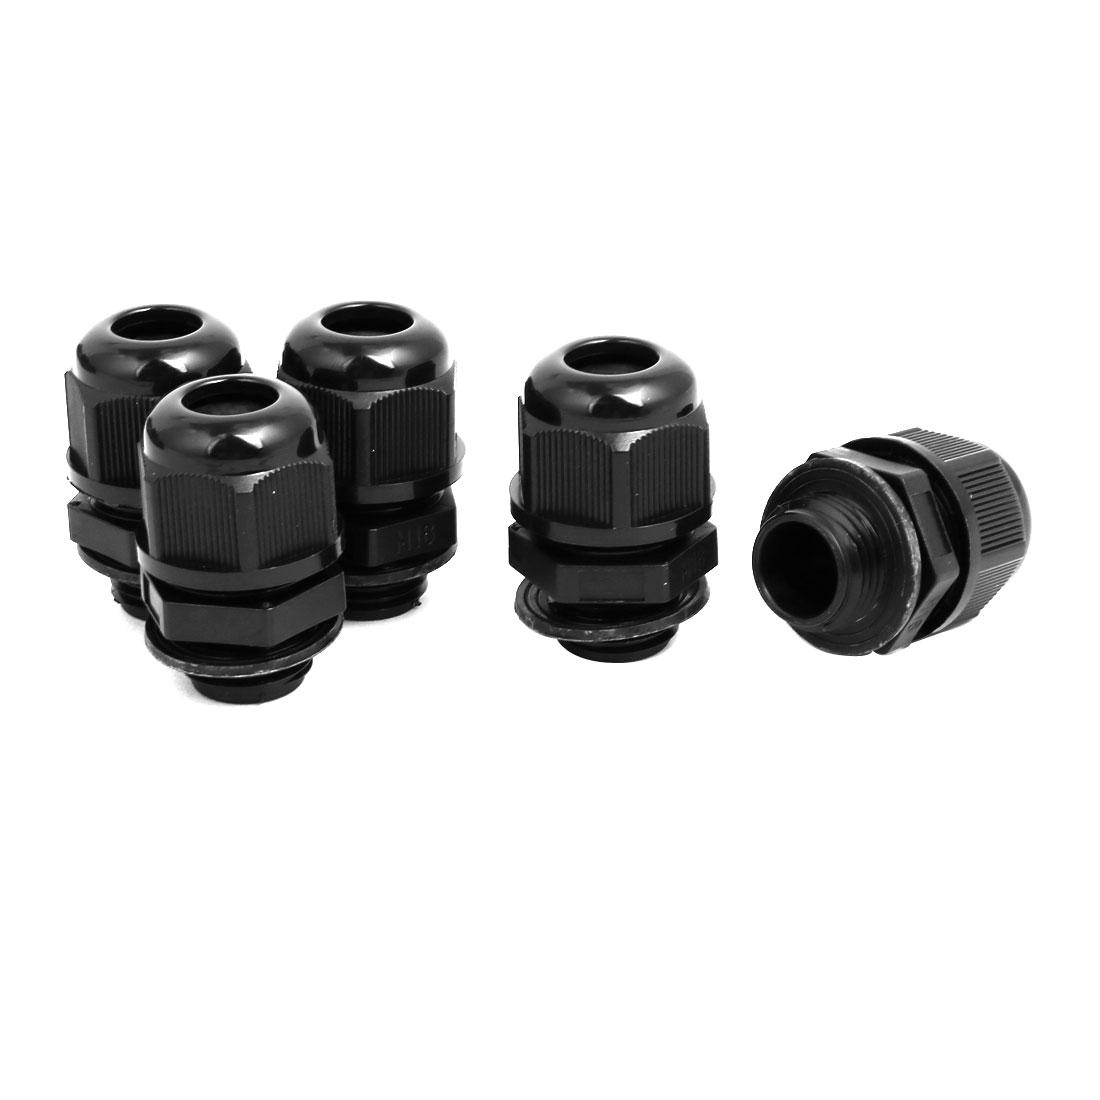 M16 x1.5mm 4mm 2 Holes Adjustable Cables Gland Black 5pcs